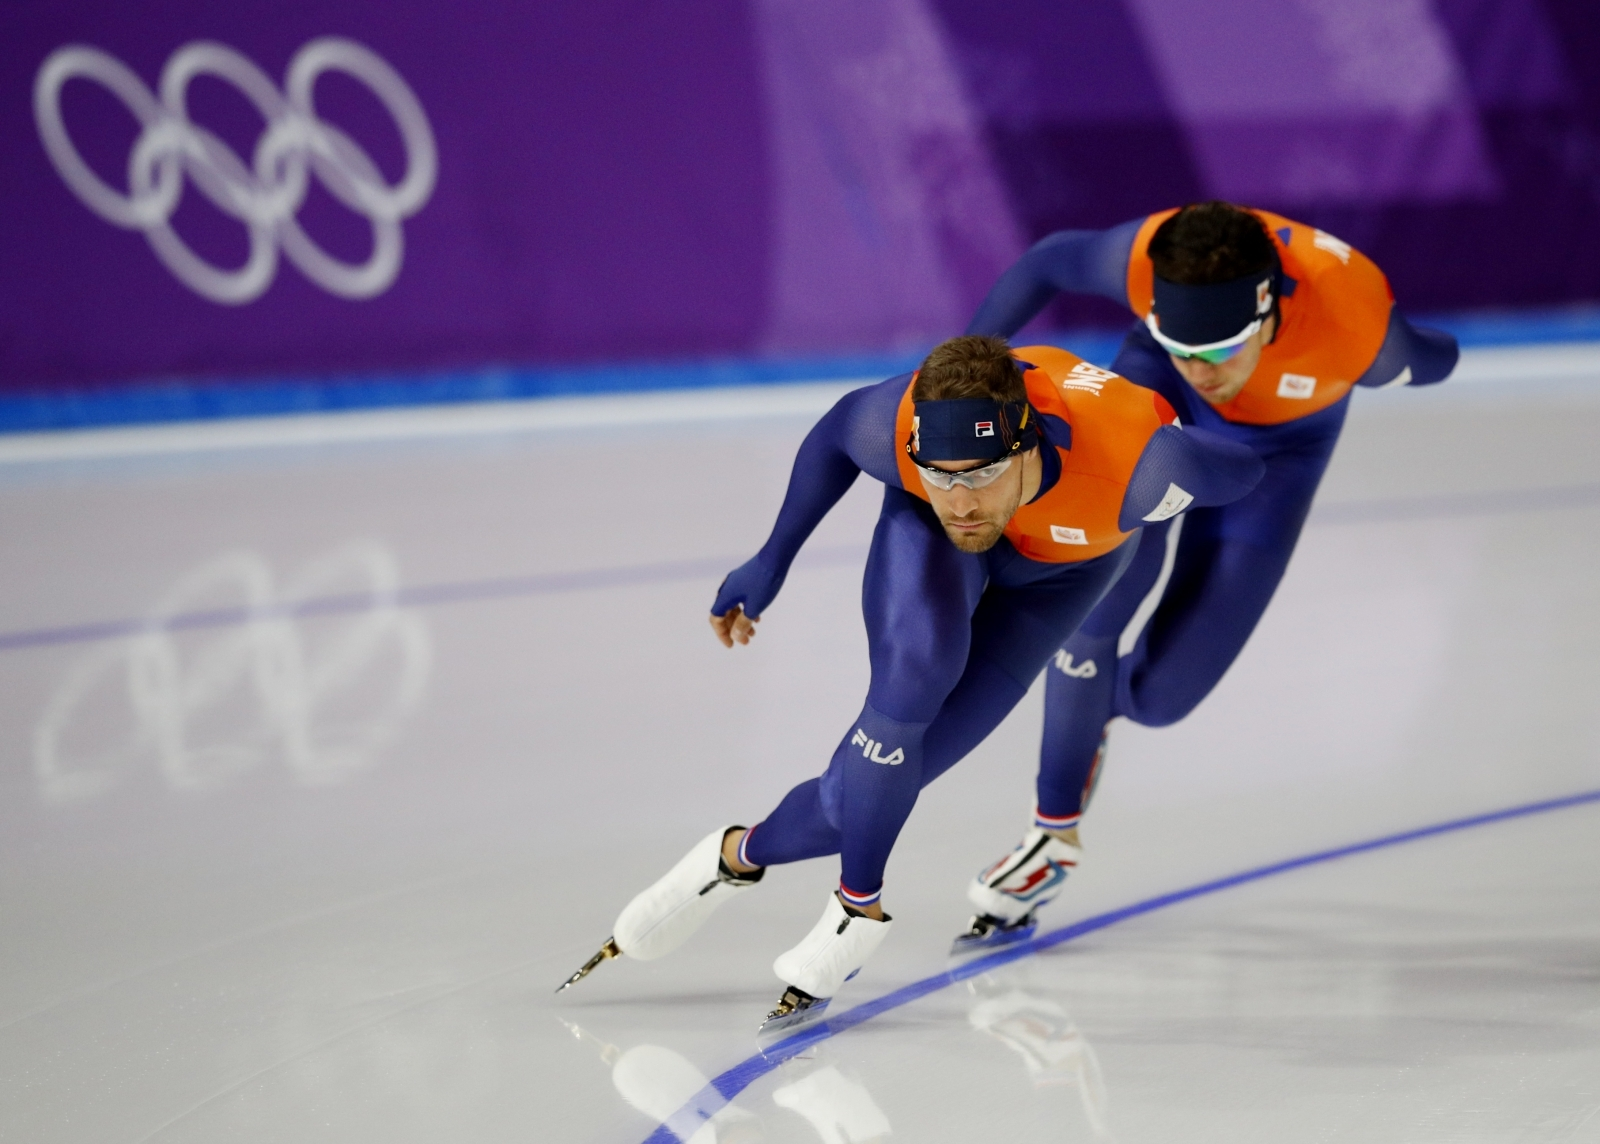 Dutch speed skating